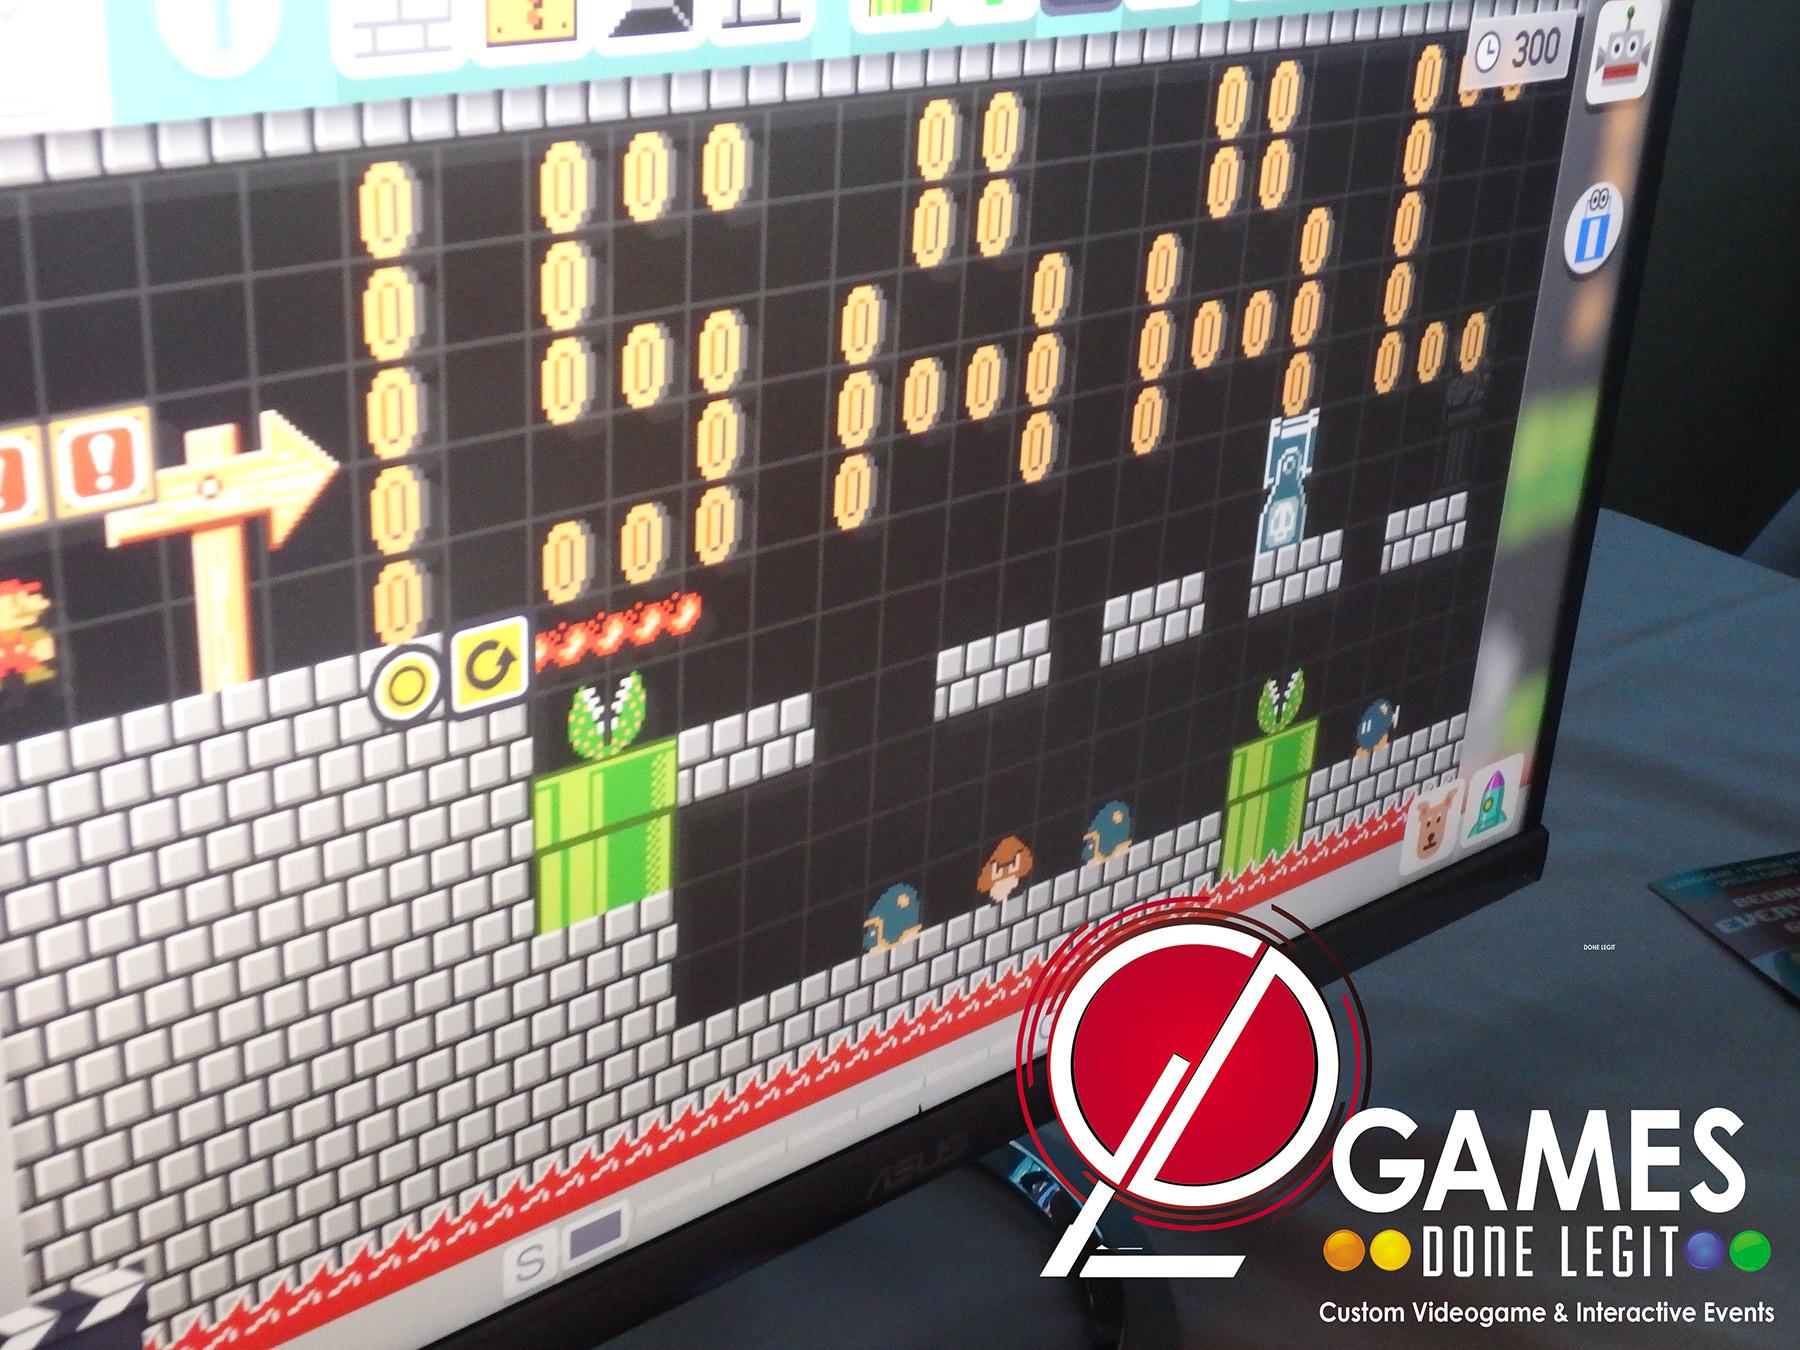 bar-mitzvah-games-done-legit-6